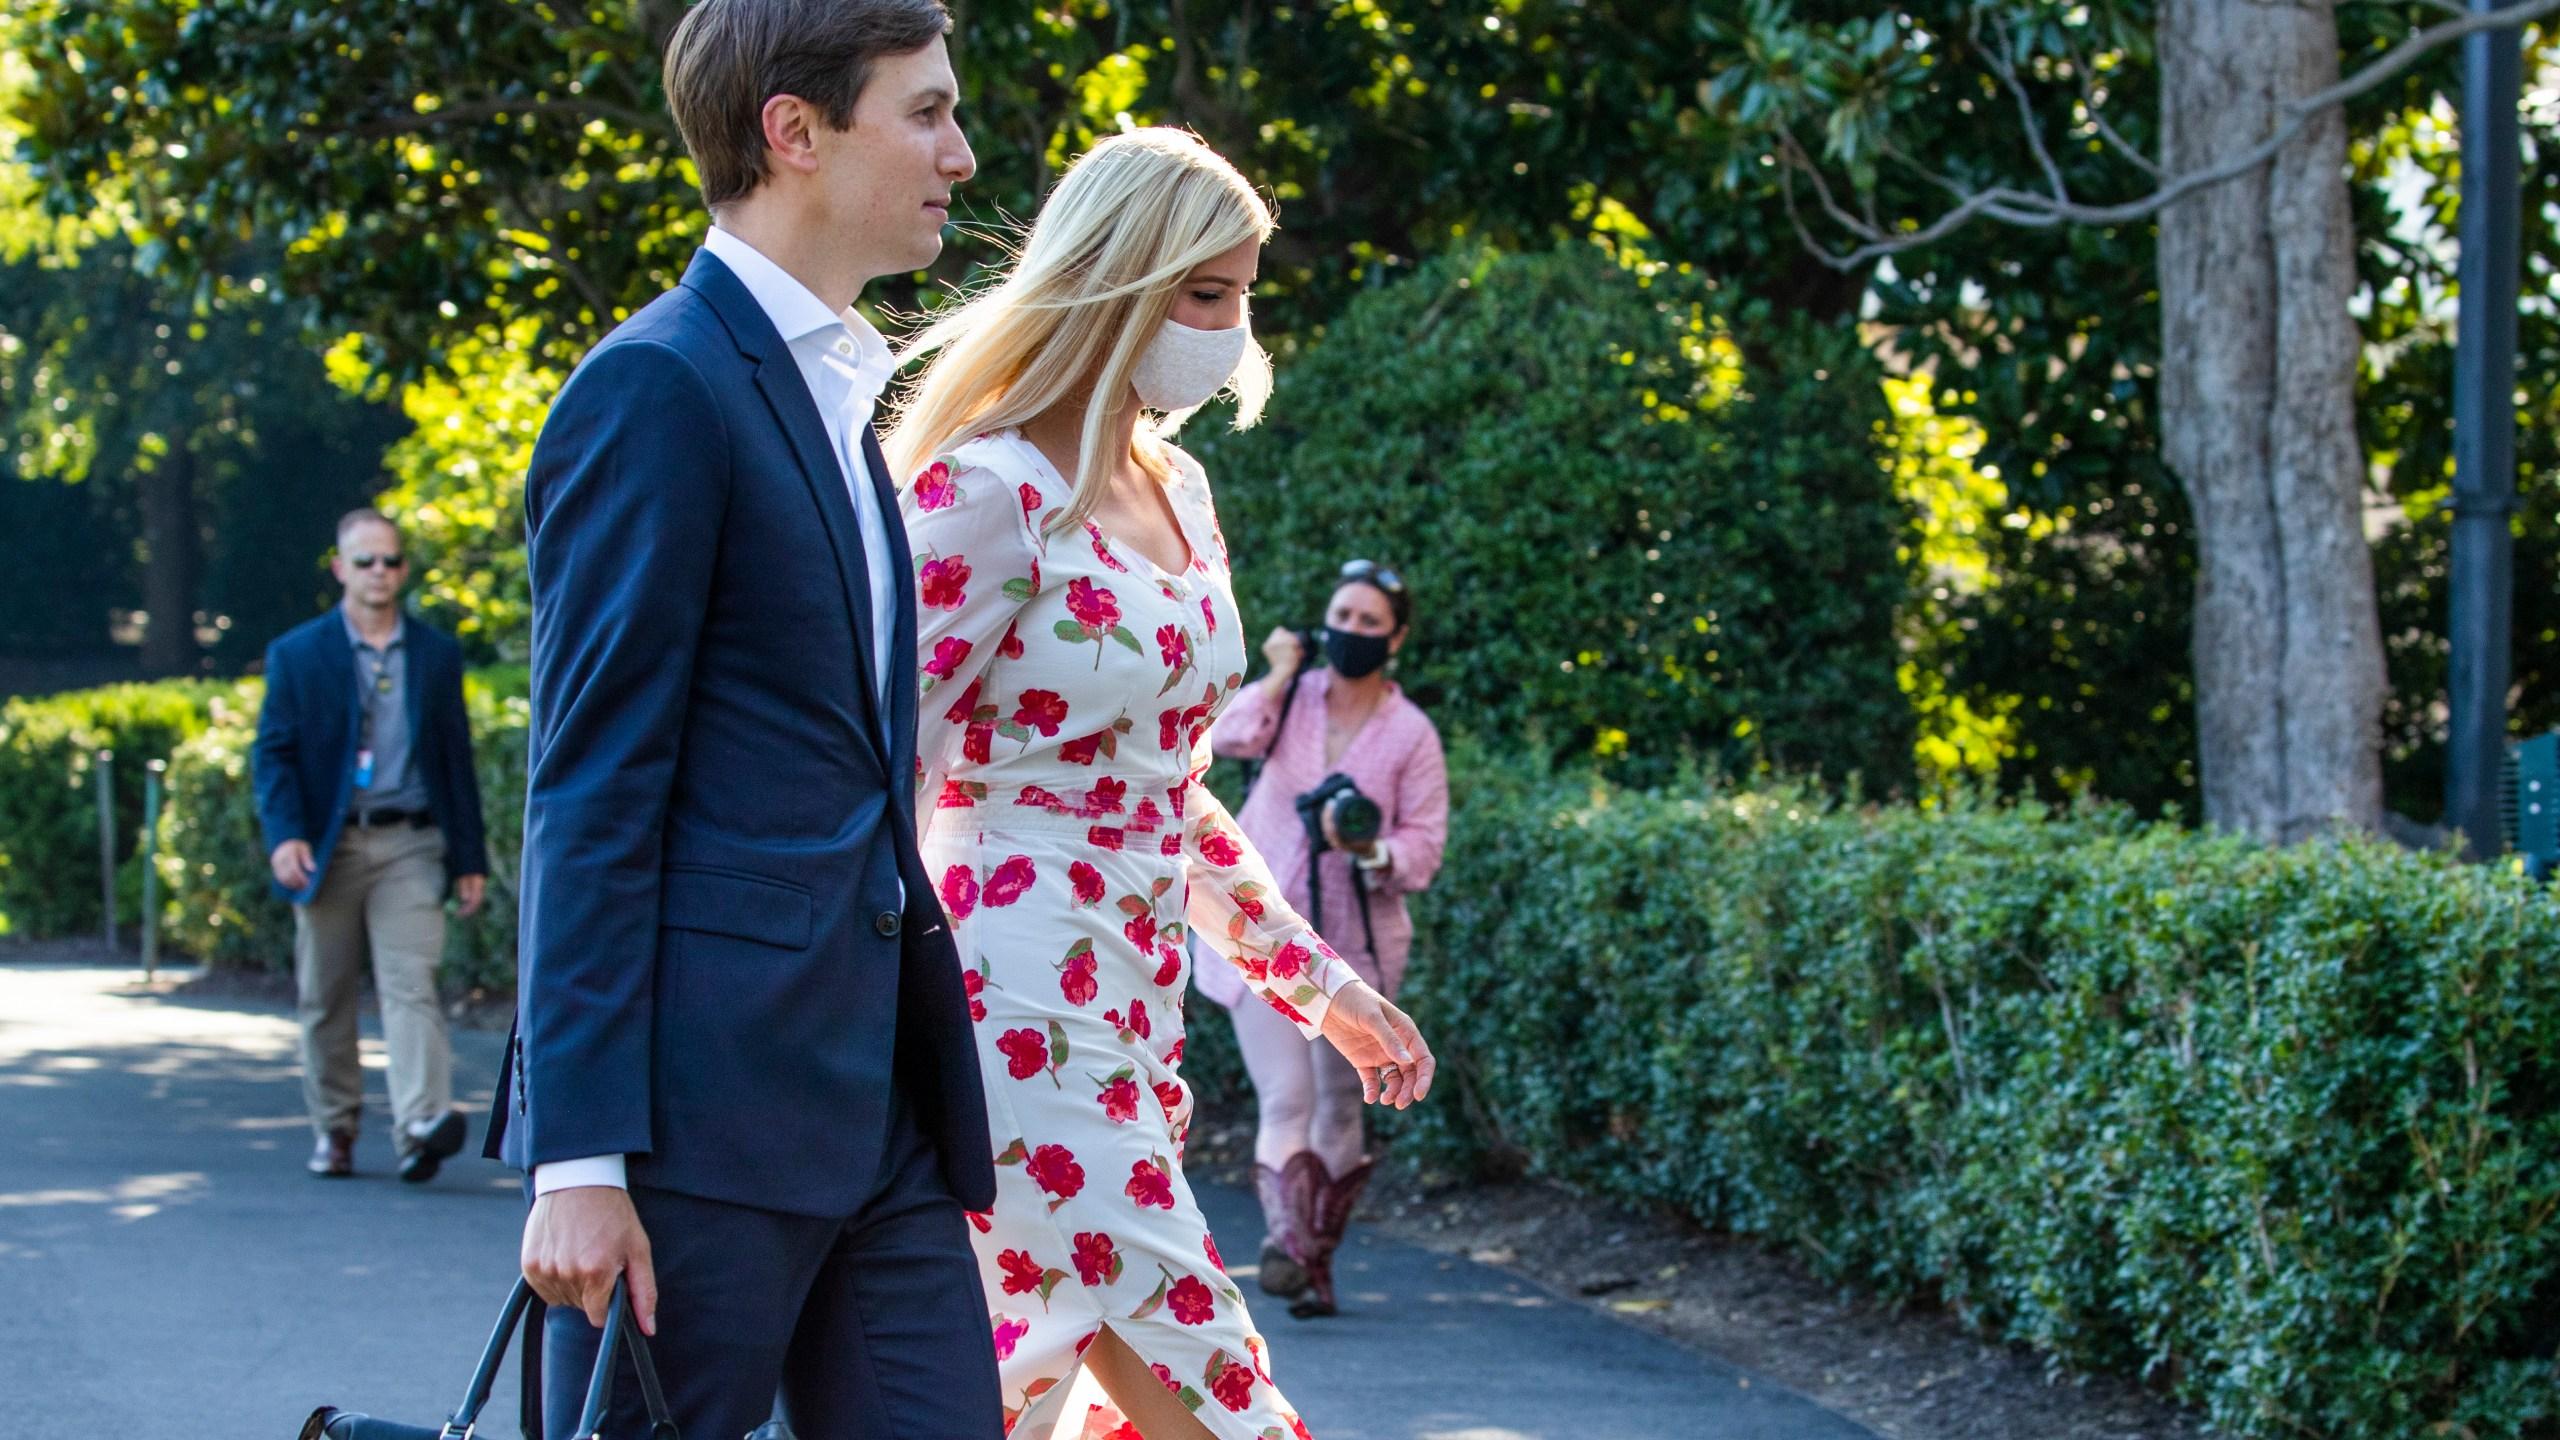 Ivanka Trump, Jared Kushner